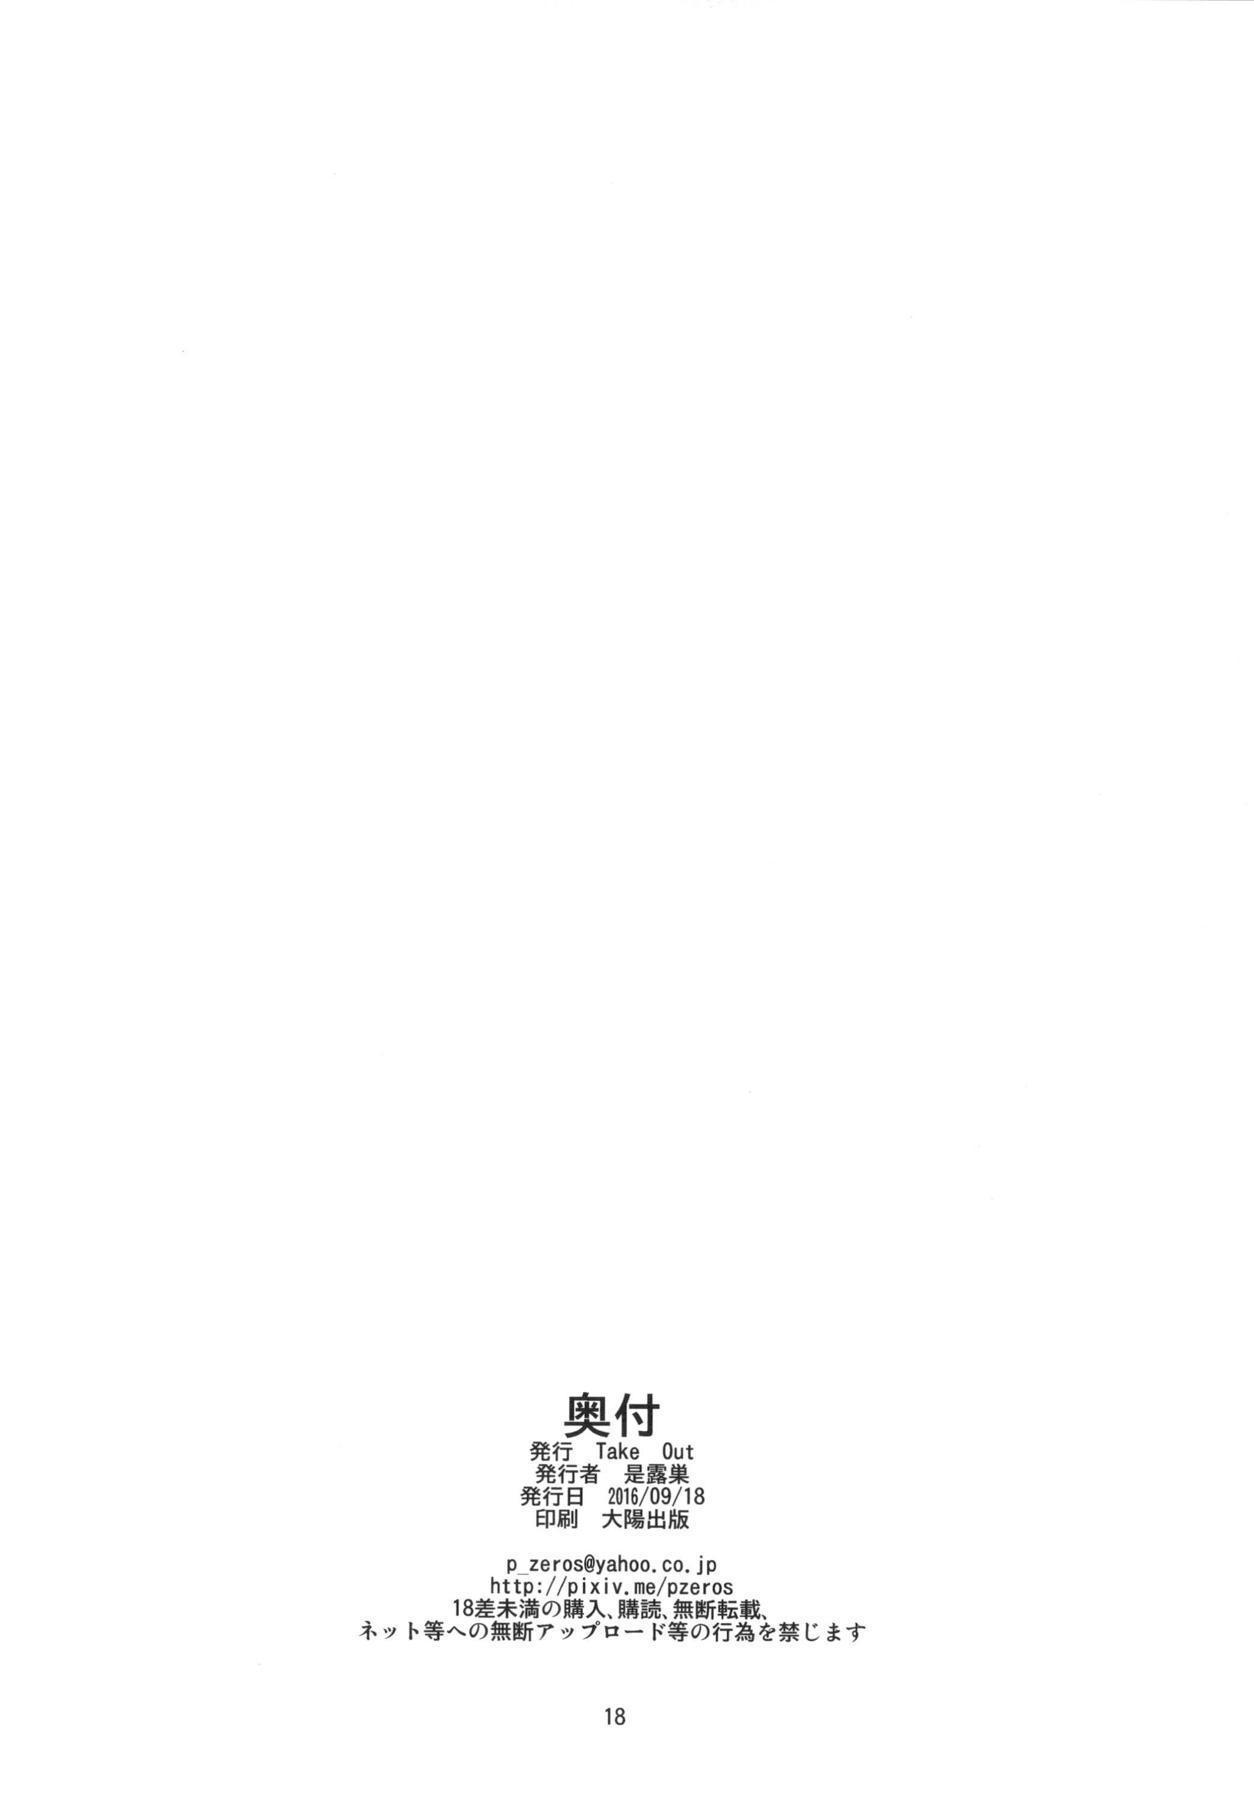 Momoiro ni Somaru 16